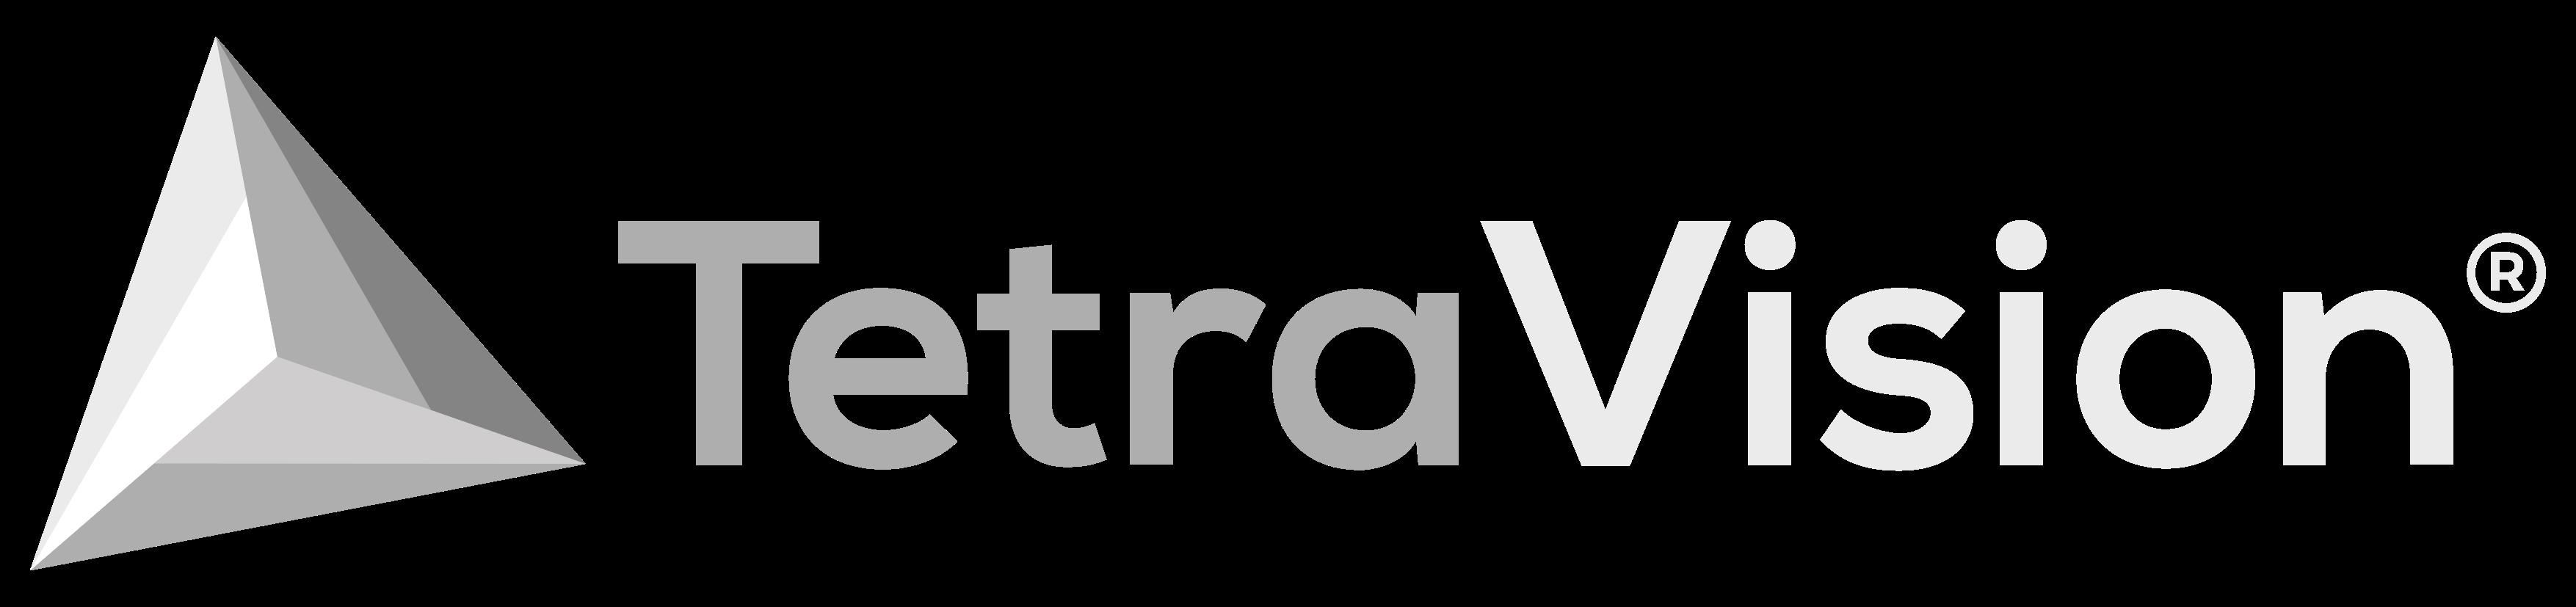 TetraVision.Shop